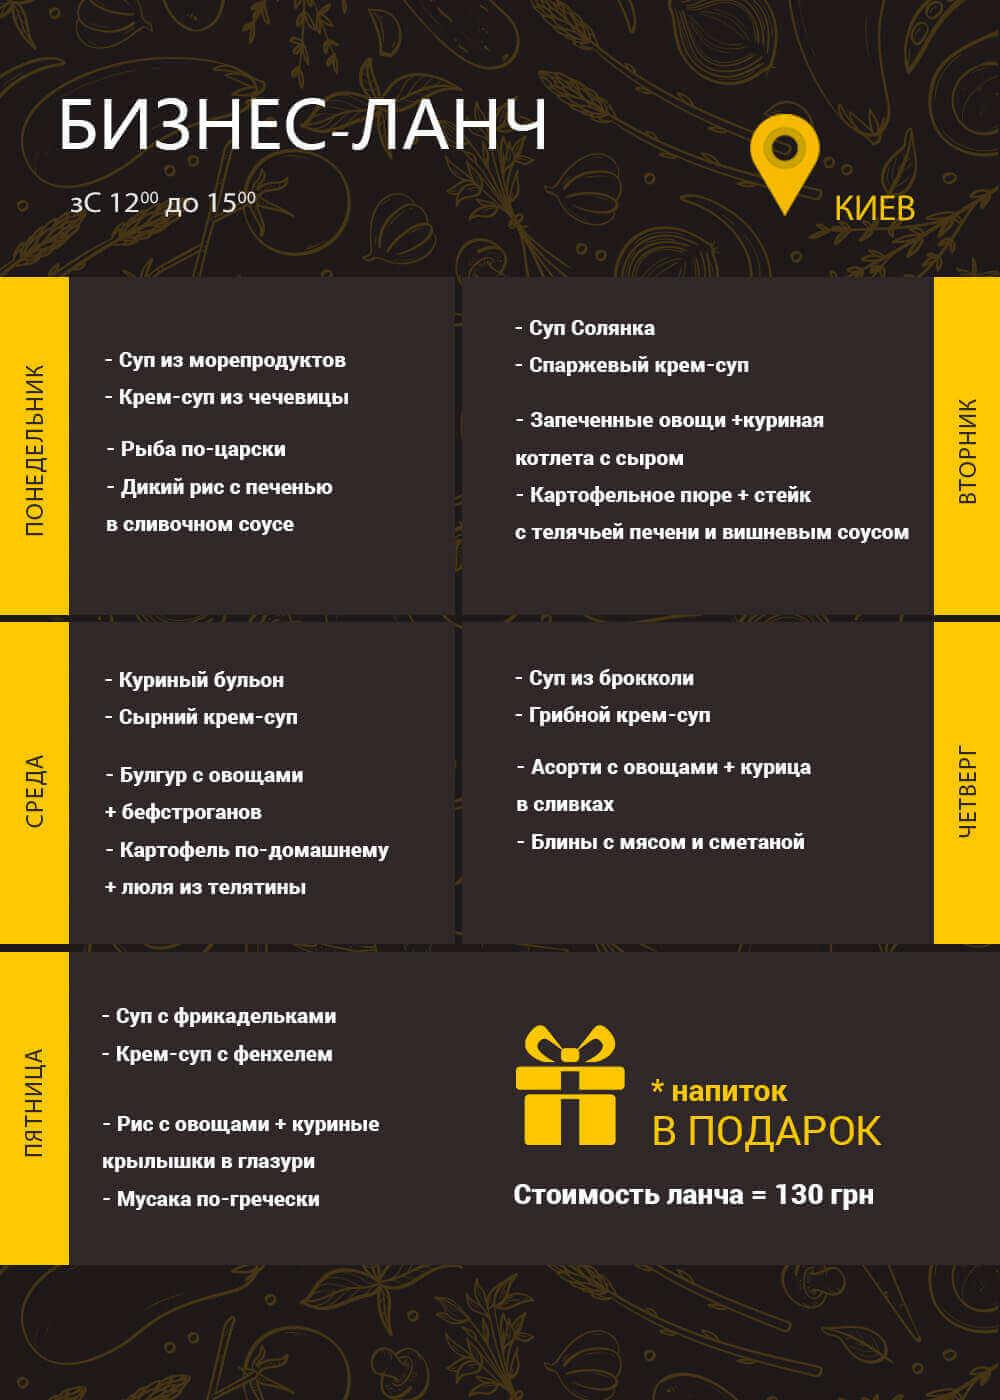 bizness_lanch_kiev